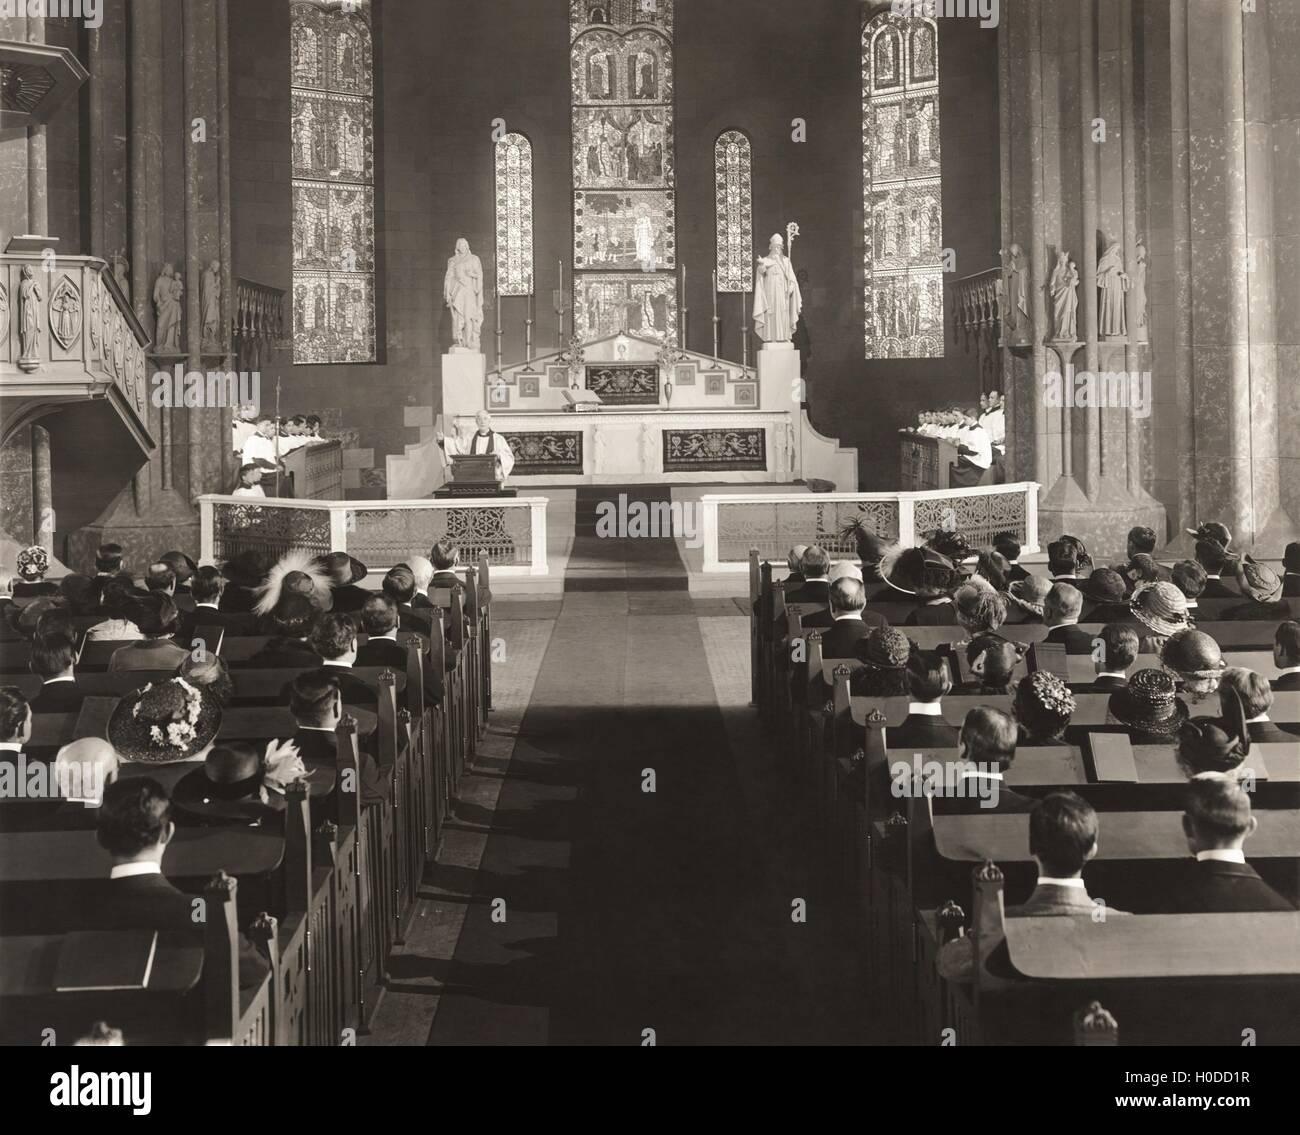 Parishioners attending mass - Stock Image